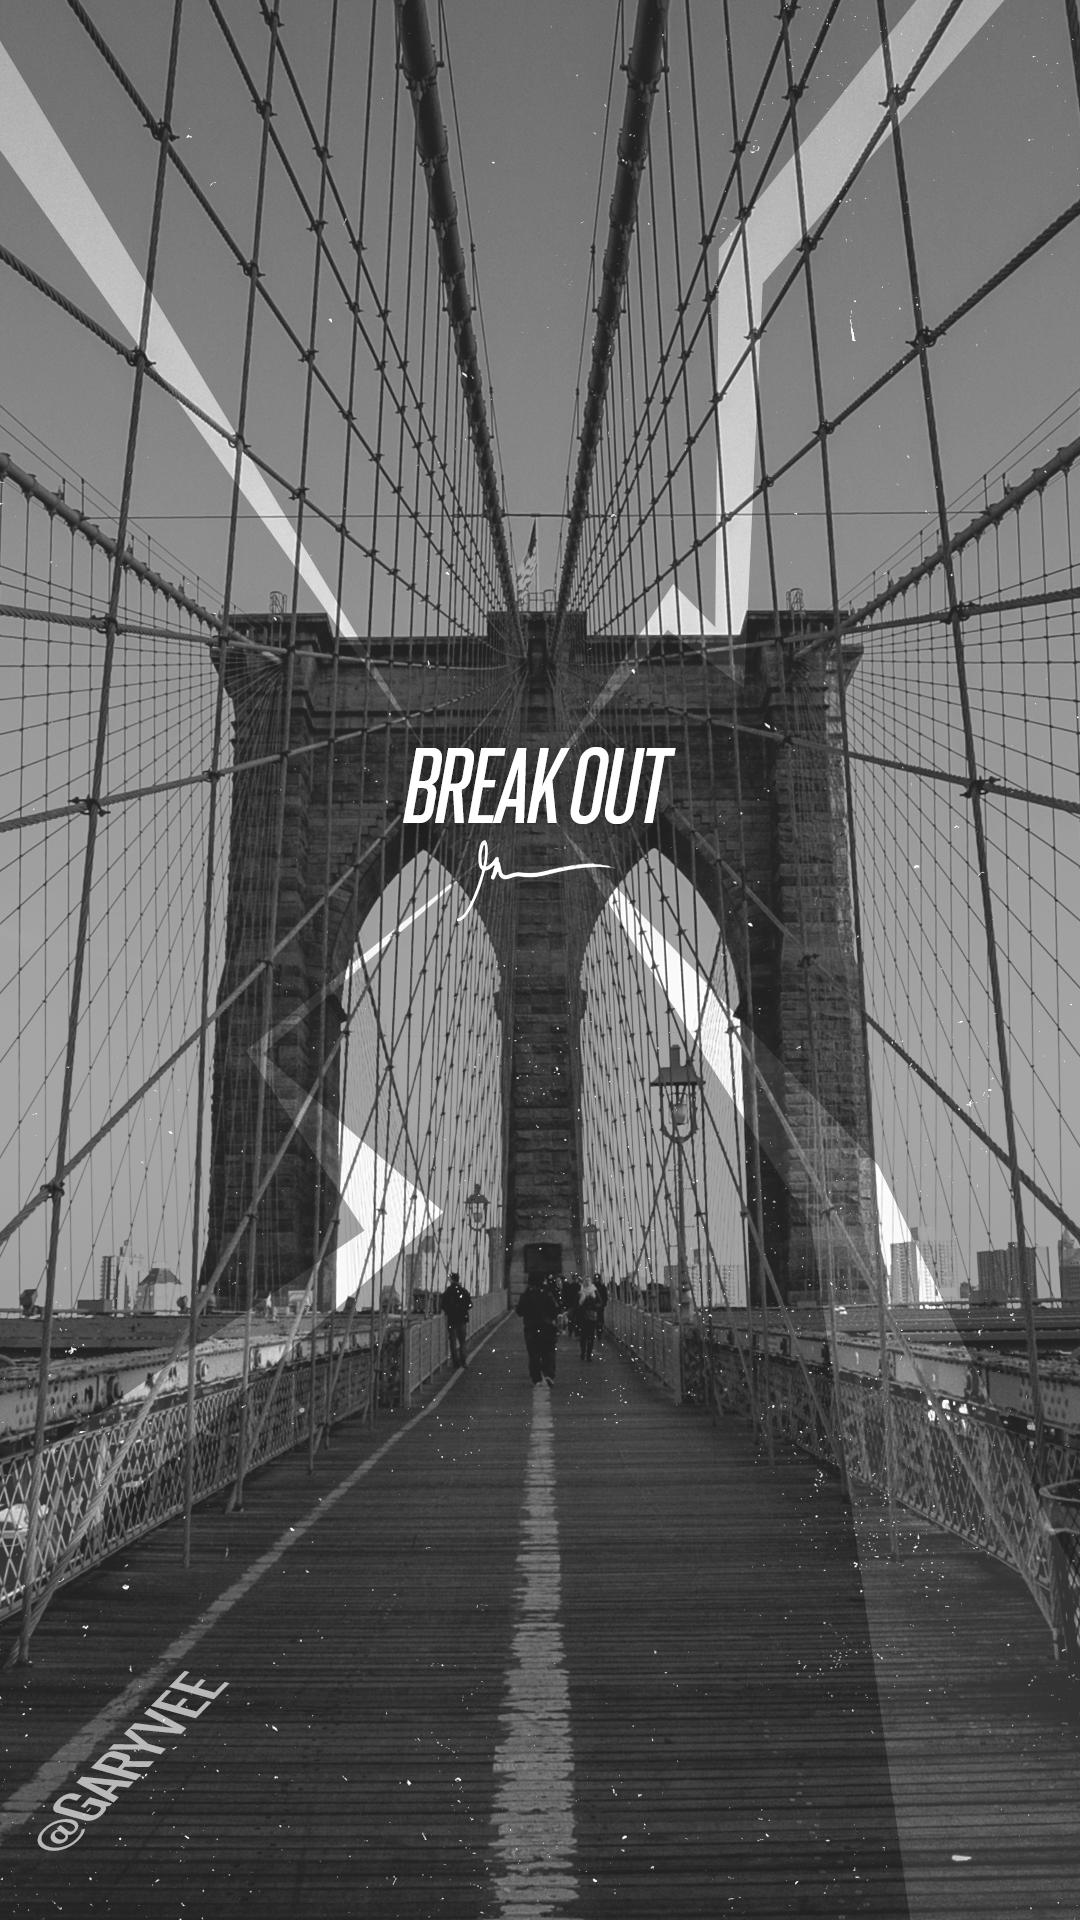 Brooklyn Bridge 1080x1920 Download Hd Wallpaper Wallpapertip